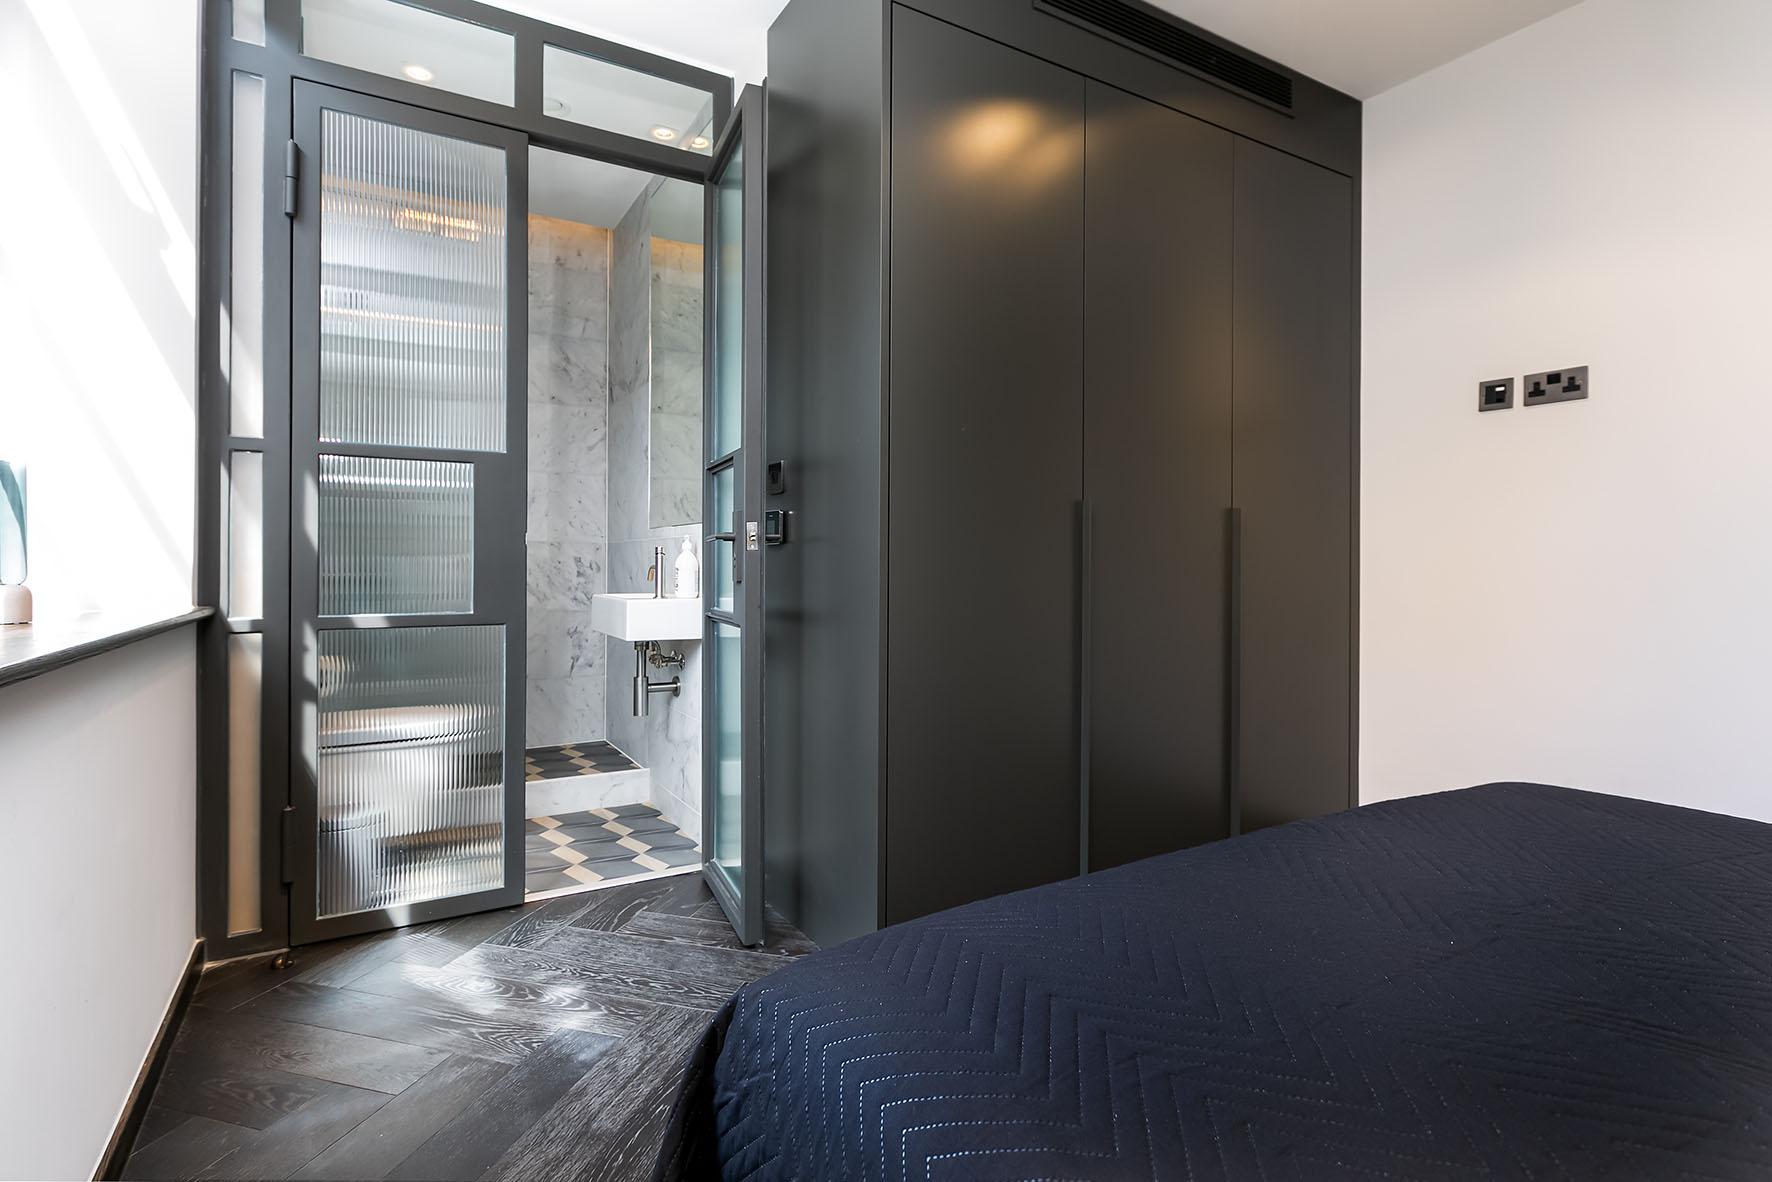 Lovelydays luxury service apartment rental - London - Soho - Oxford Street IV - Lovelysuite - 2 bedrooms - 2 bathrooms - Queen bed - 3d7b5e09a81f - Lovelydays